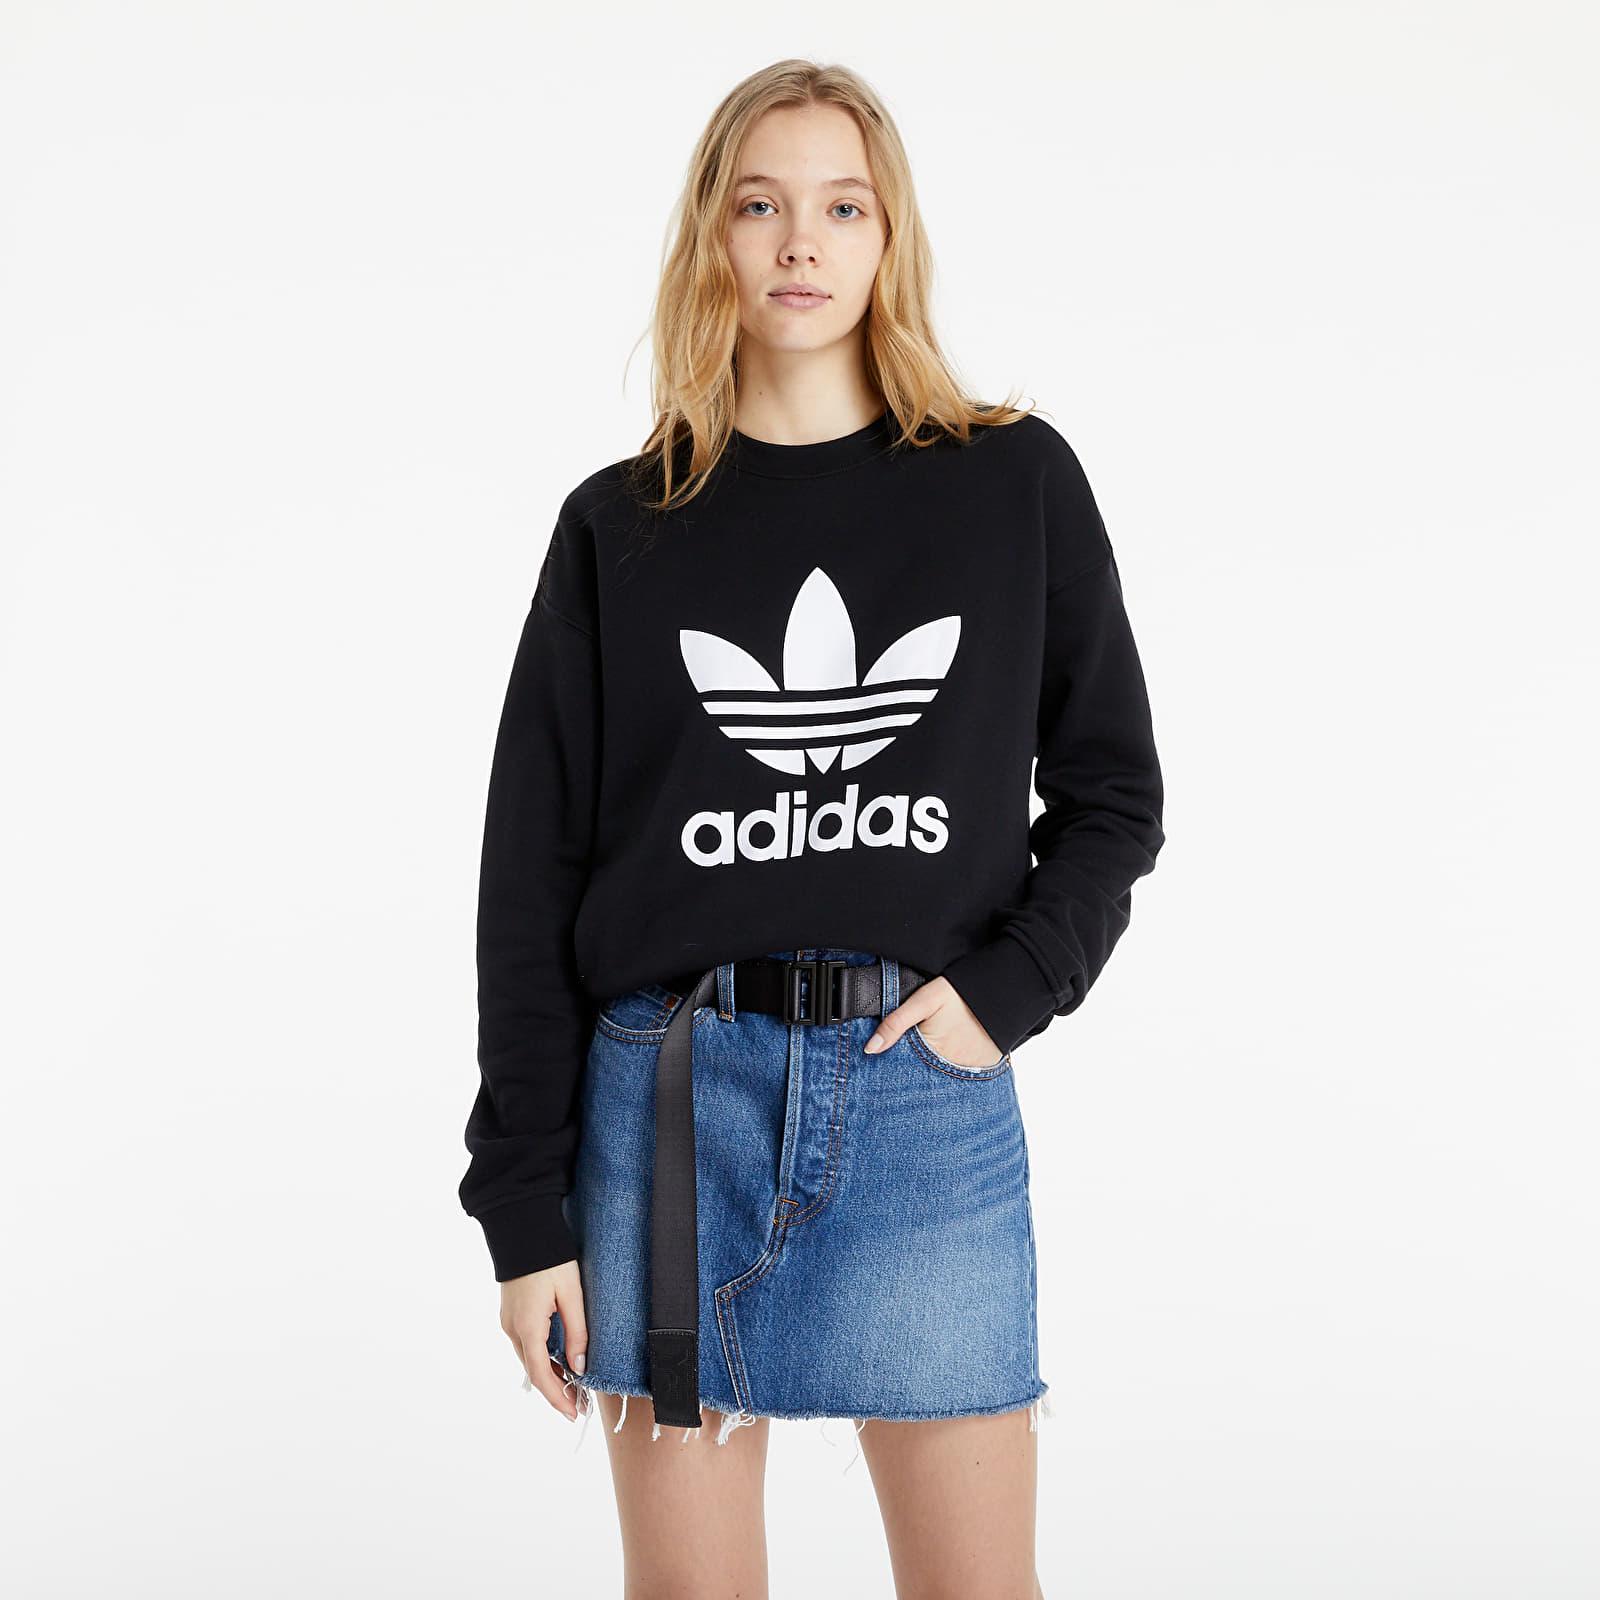 adidas Originals Trefoil Sweatshirt Black/ White S/34